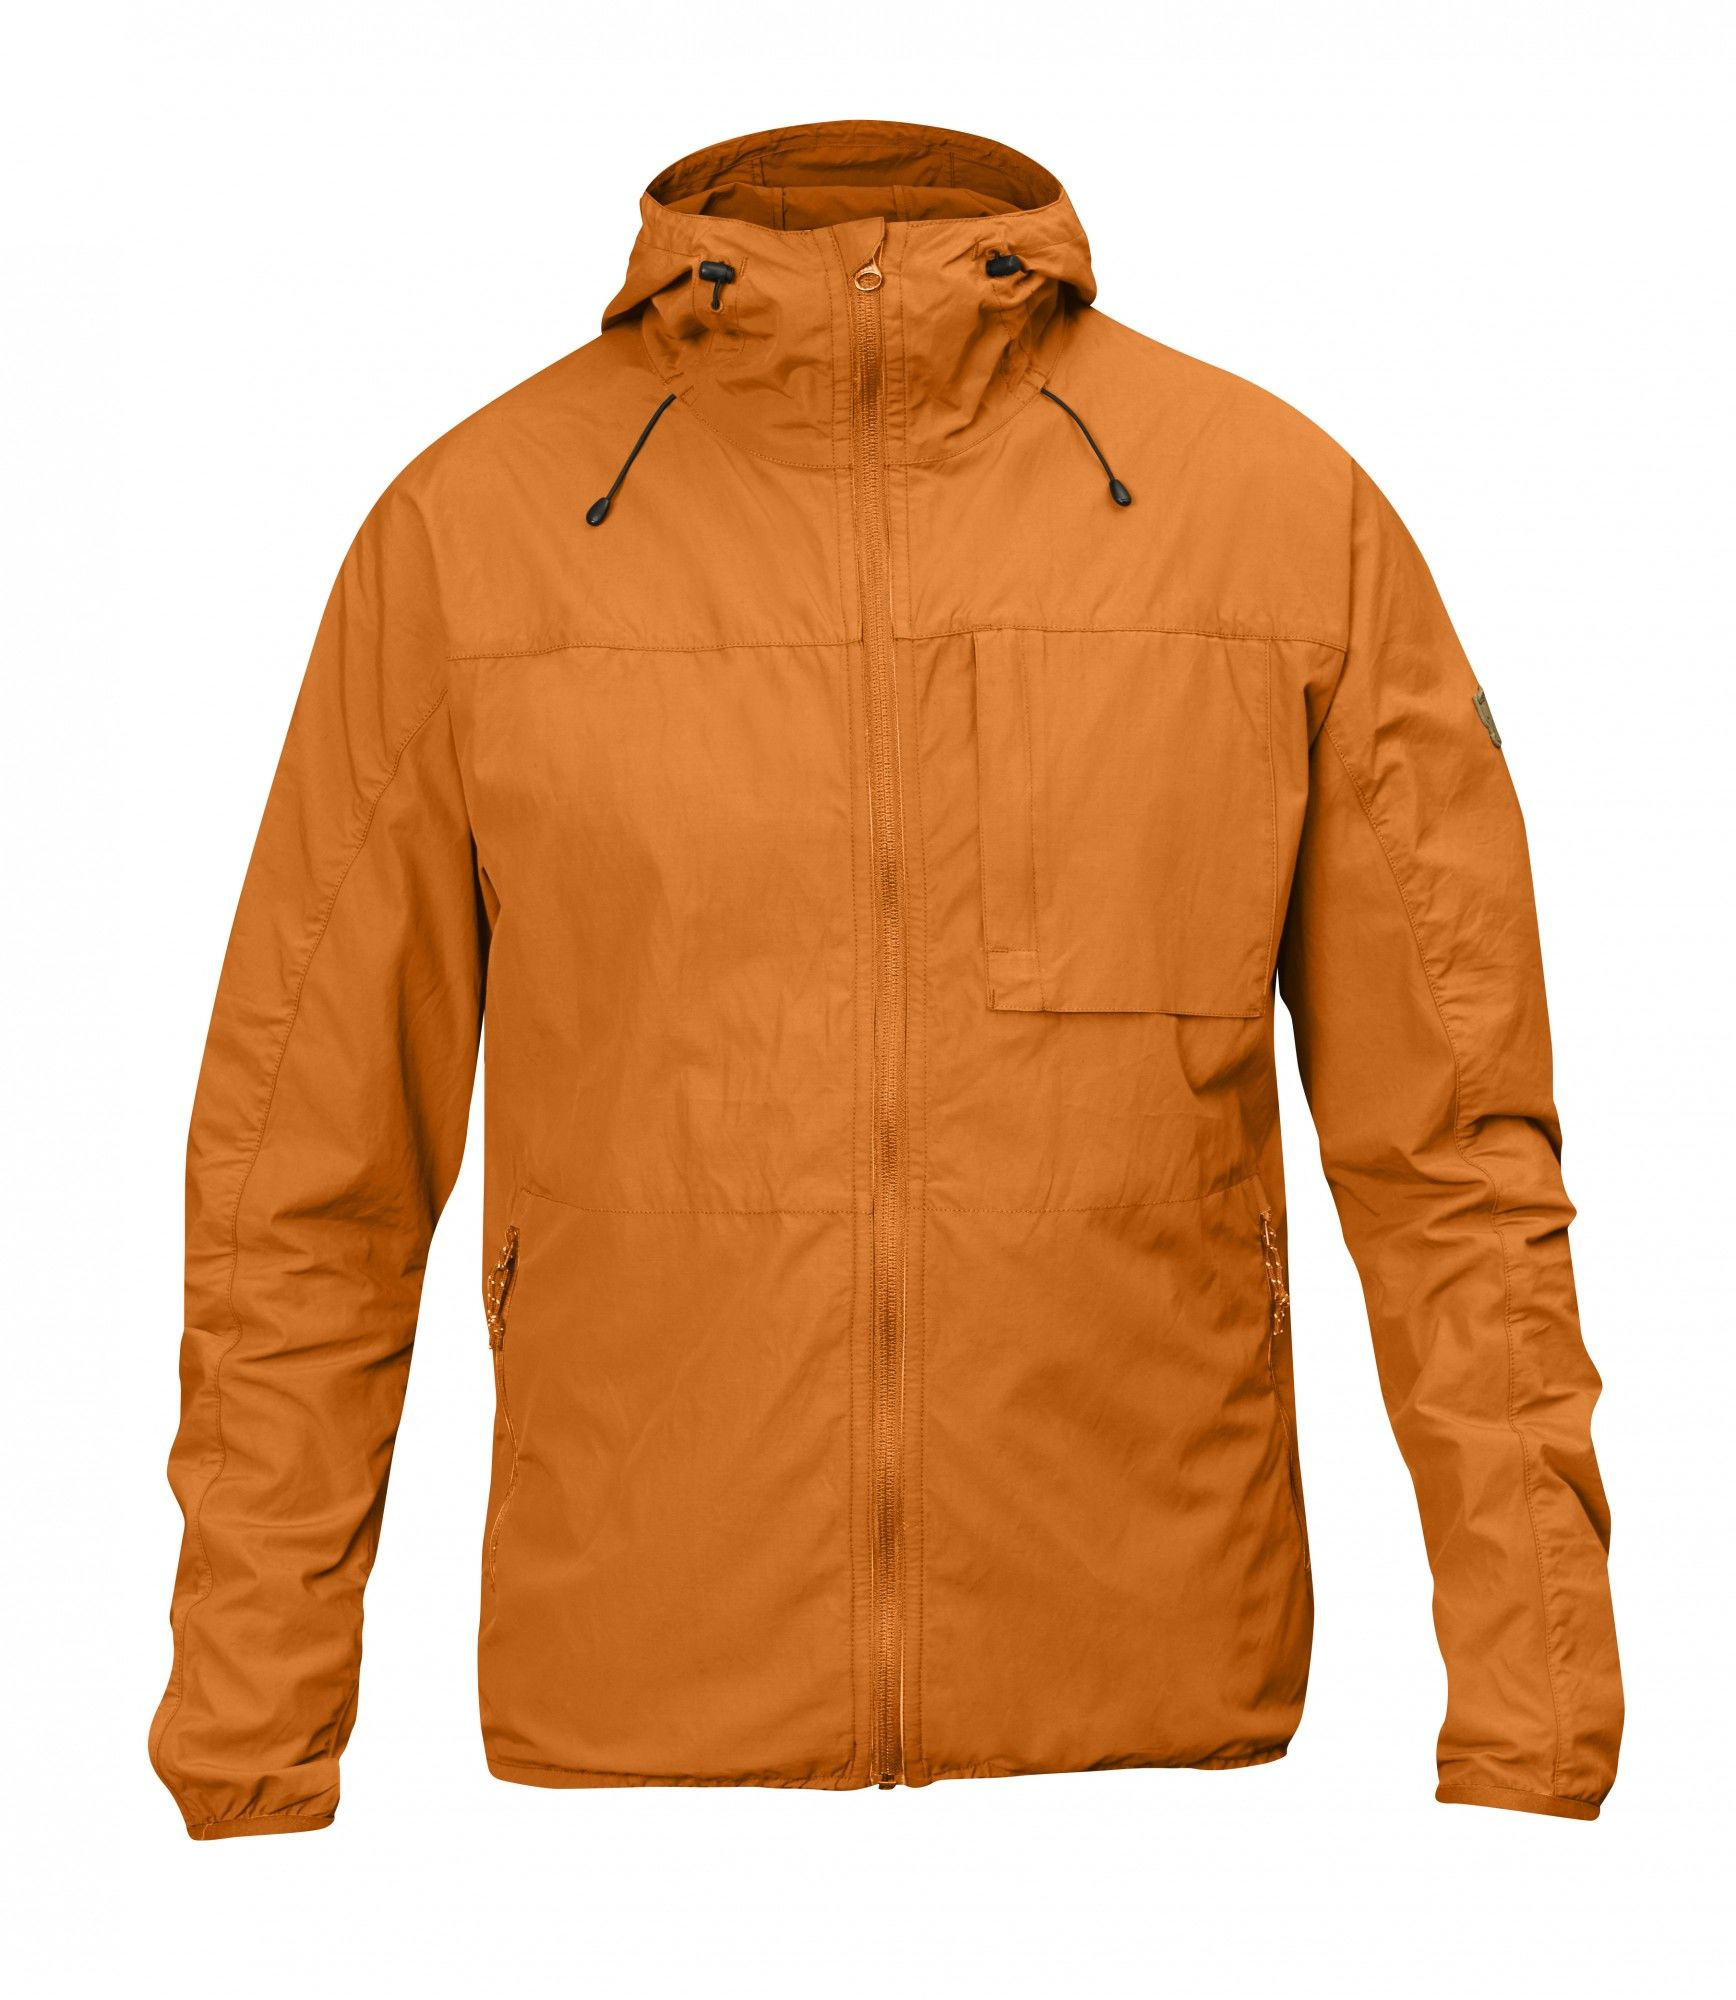 Fjällräven High Coast Wind Jacket Orange, Male Freizeitjacke, ... 94af042d7c